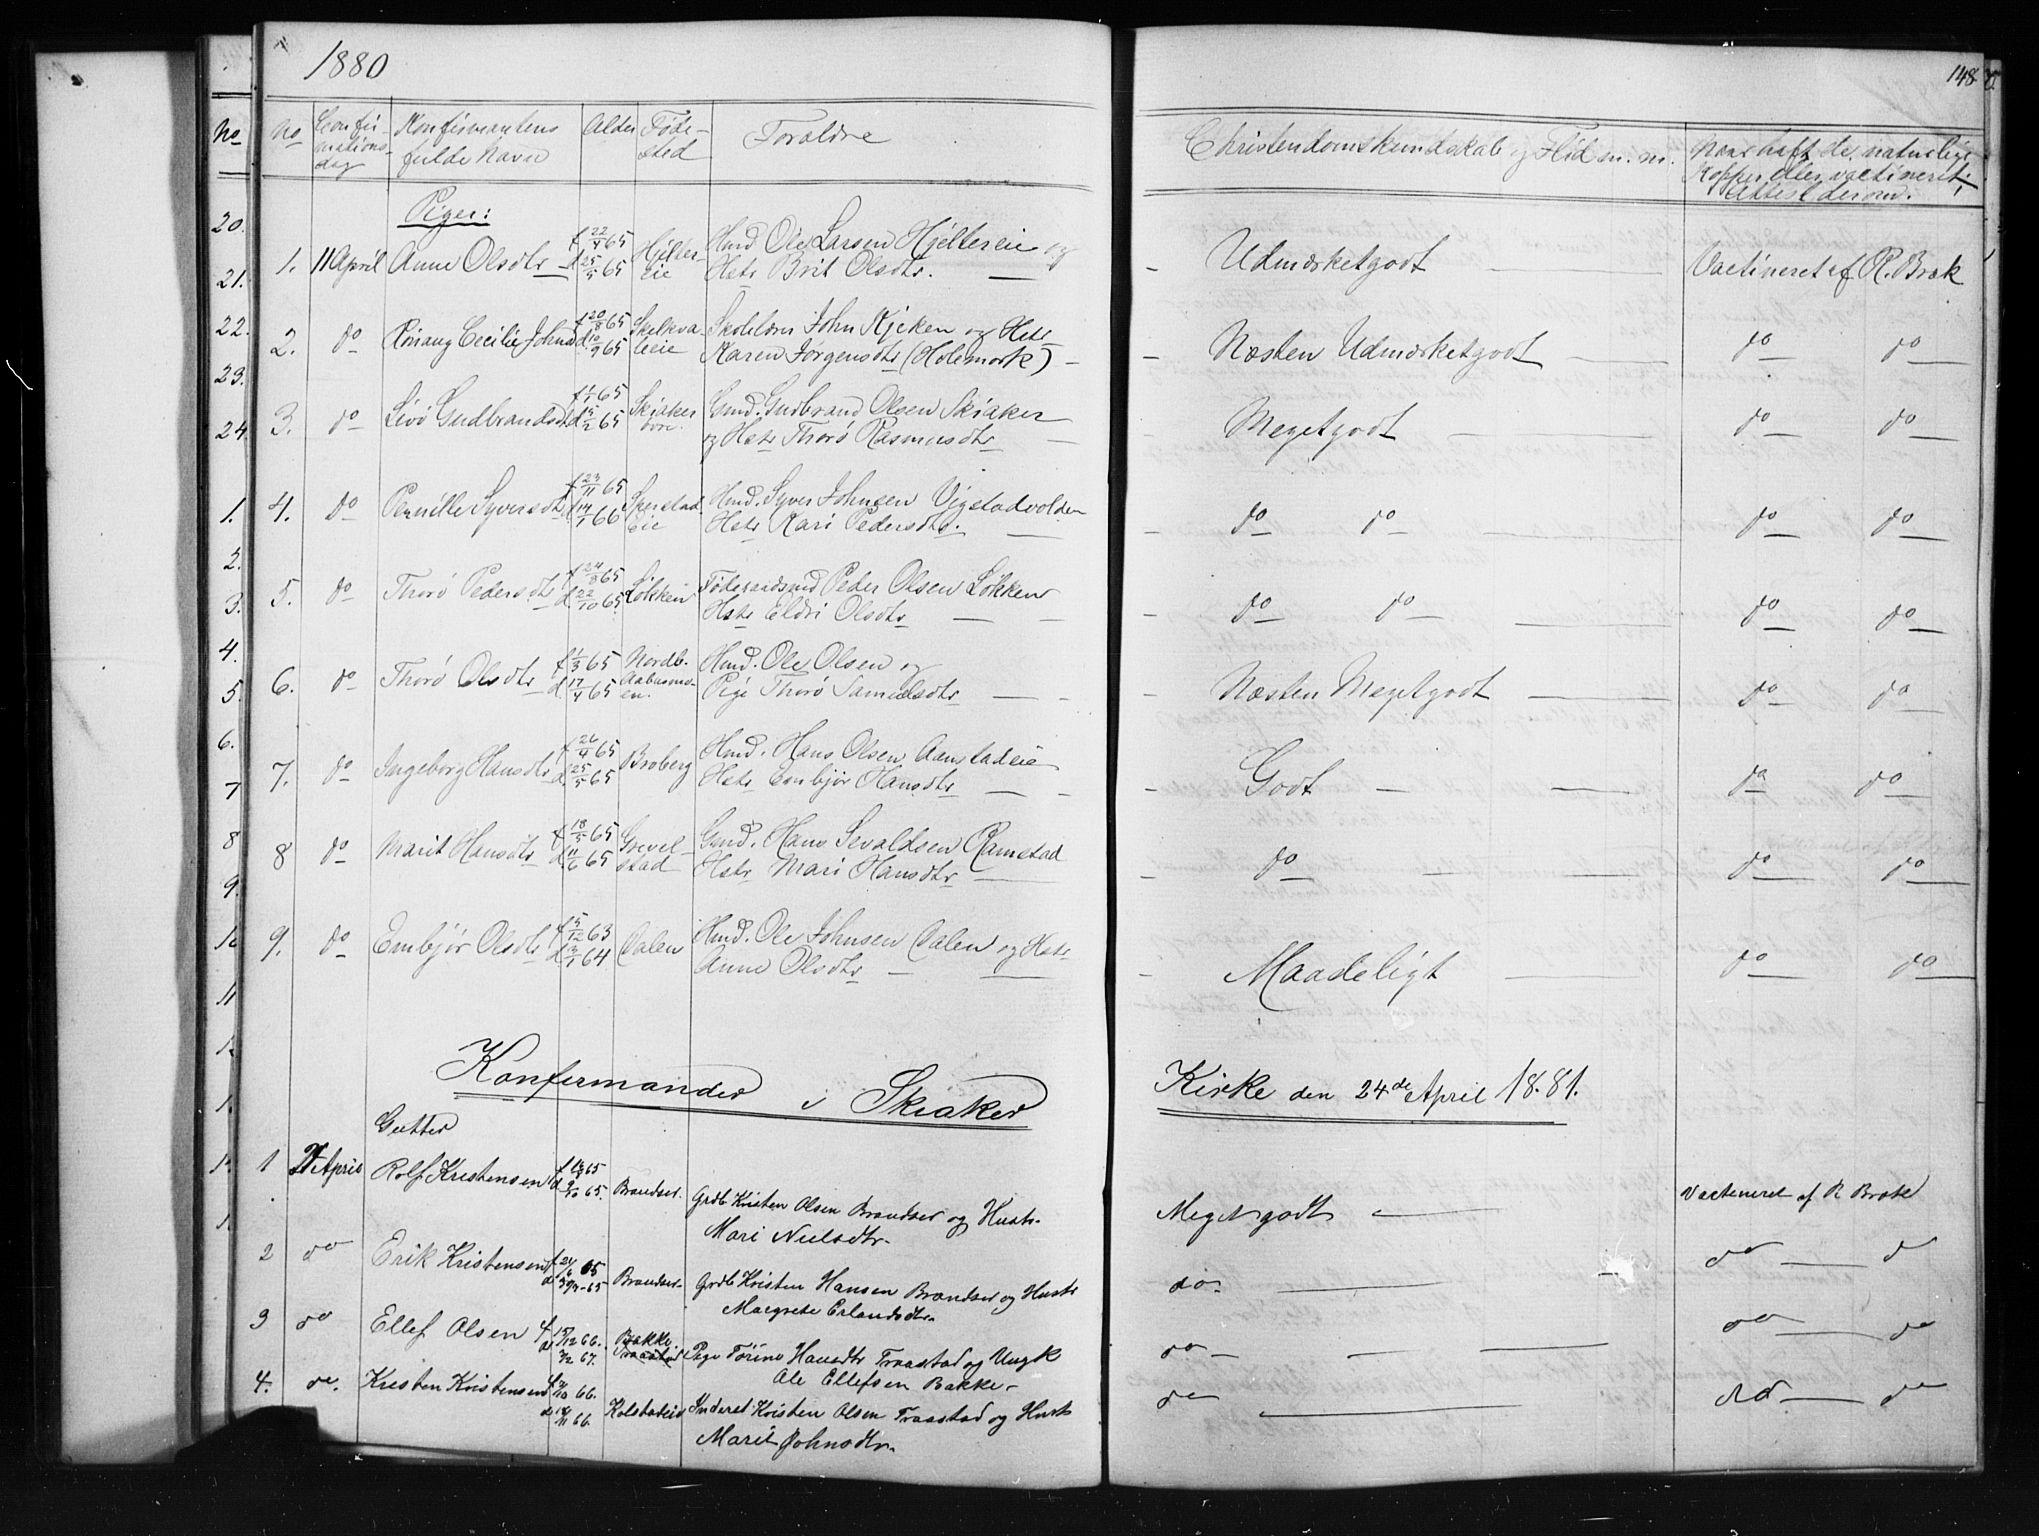 SAH, Skjåk prestekontor, Klokkerbok nr. 1, 1865-1893, s. 148